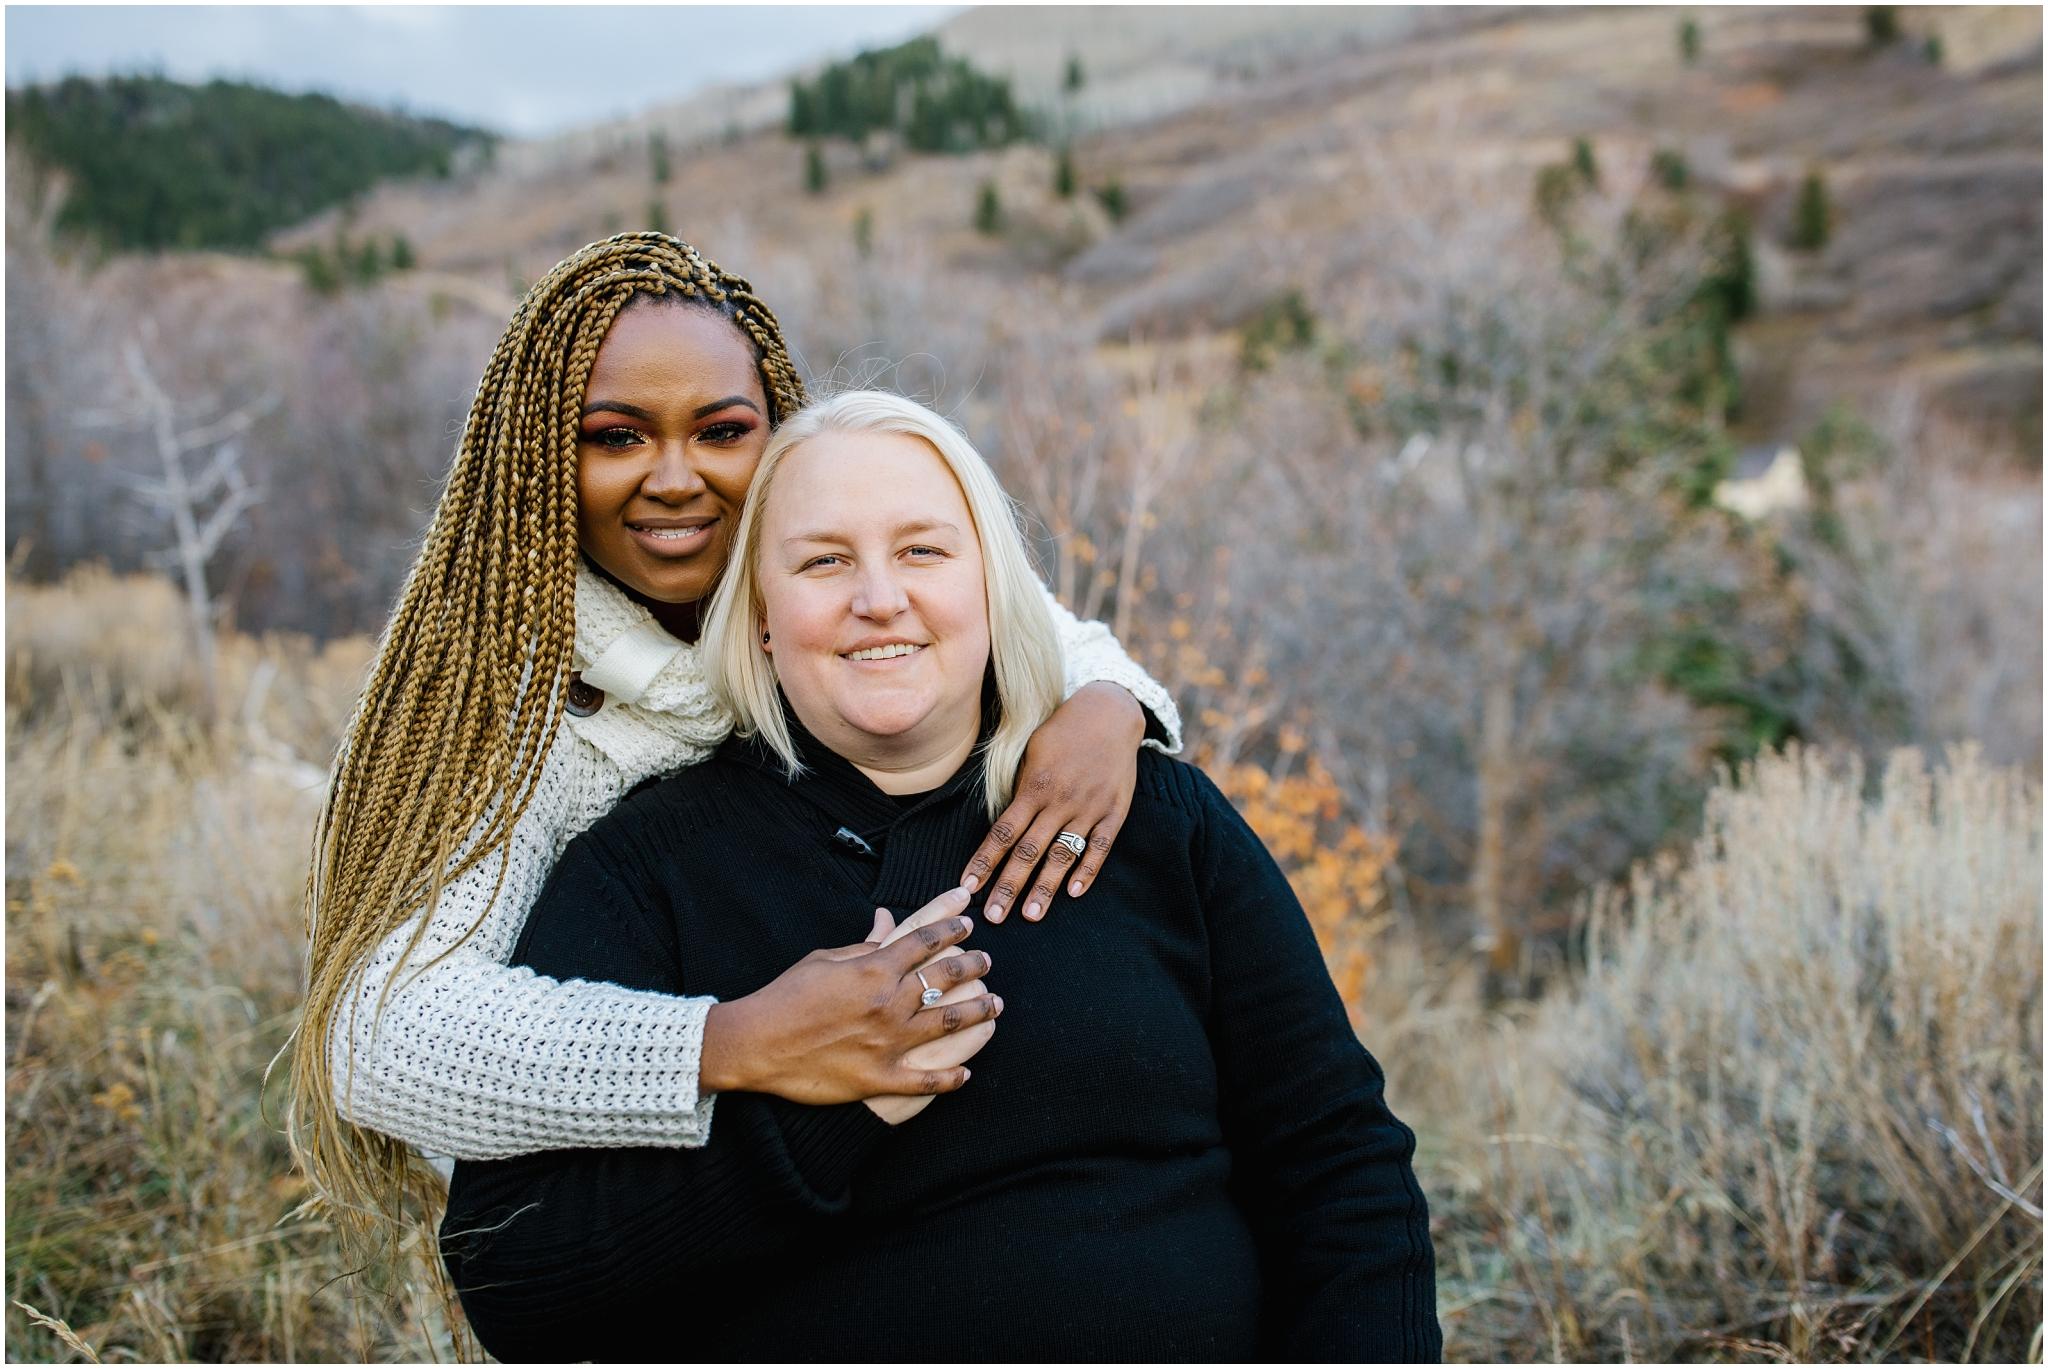 LisaTiffany2018-136_Lizzie-B-Imagery-Utah-Family-Photographer-Salt-Lake-City-Park-City-Miners-Hospital-Community-Center.jpg